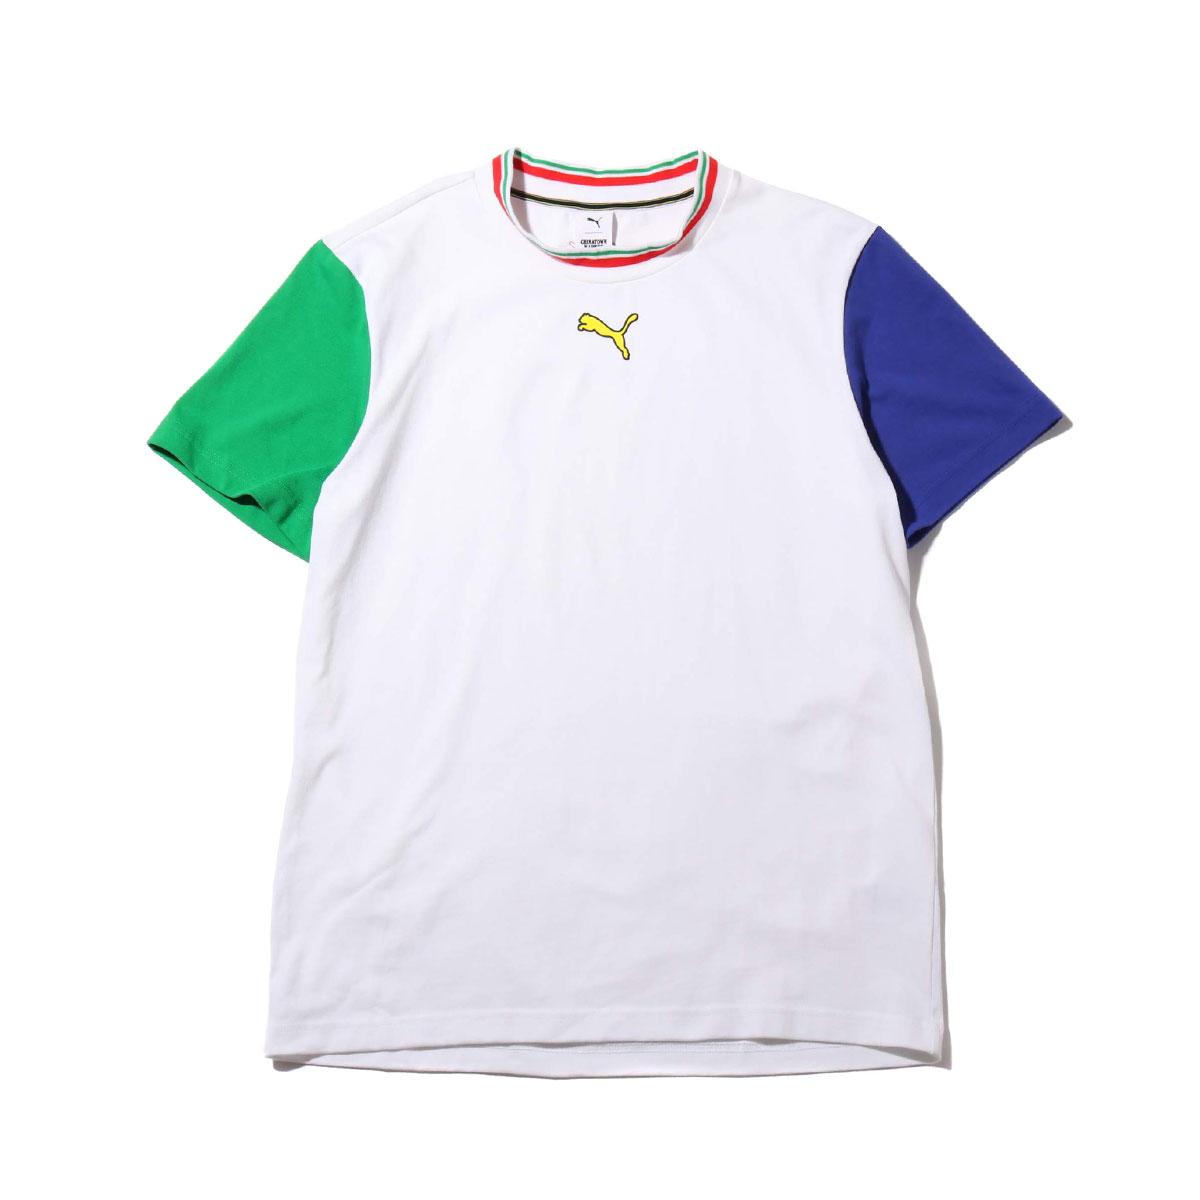 PUMA X CTM COLORBLOCK TEE(PUMA WHITE)(プーマ X CTM カラーブロック ティーシャツ)【メンズ】【半袖Tシャツ】【19FA-S】